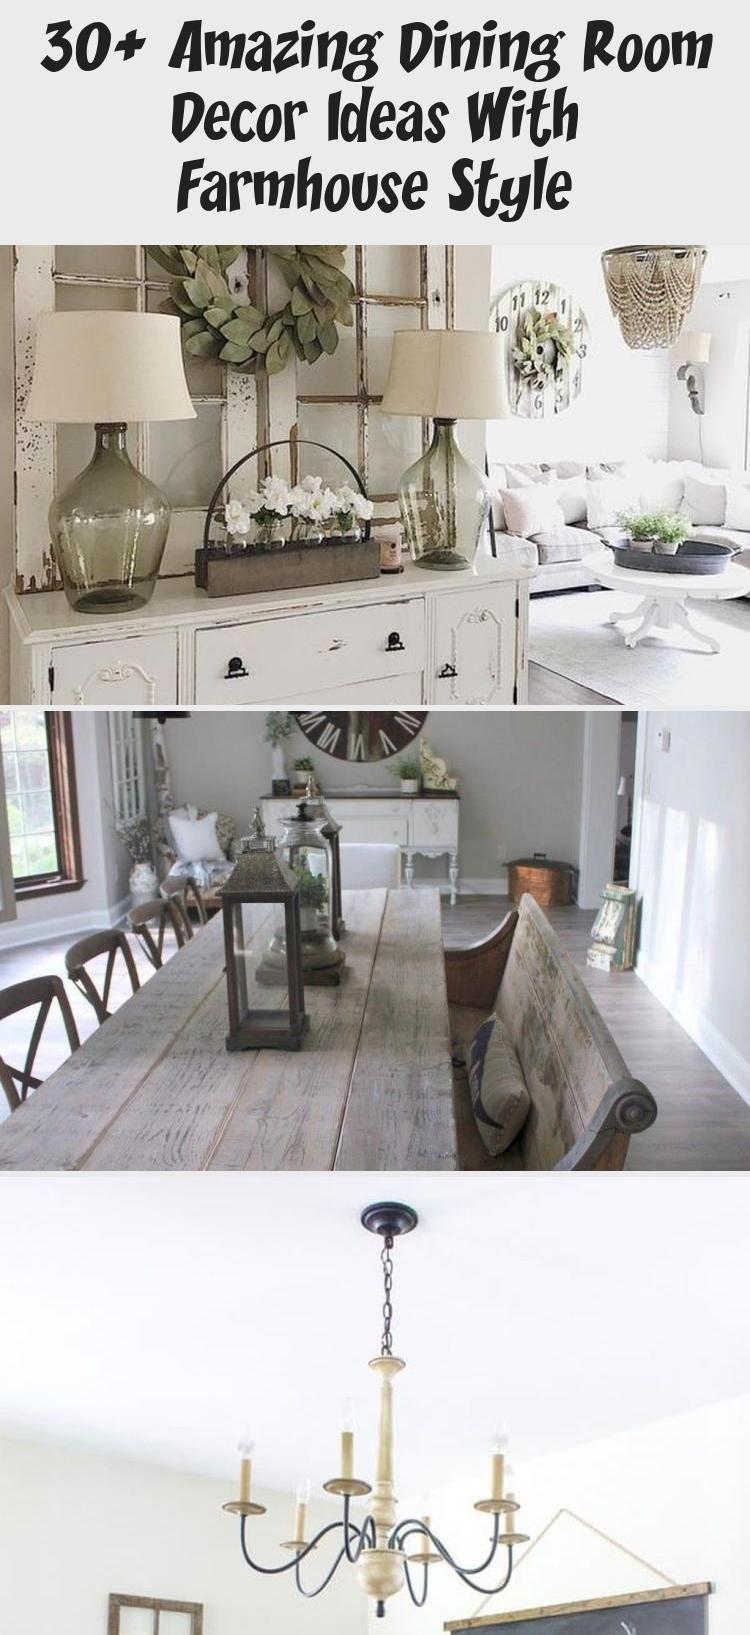 30 Amazing Dining Room Decor Ideas With Farmhouse Style Trendecora Diningroomdesigncon Dining Room Decor Dining Room Design Contemporary Dining Room Design